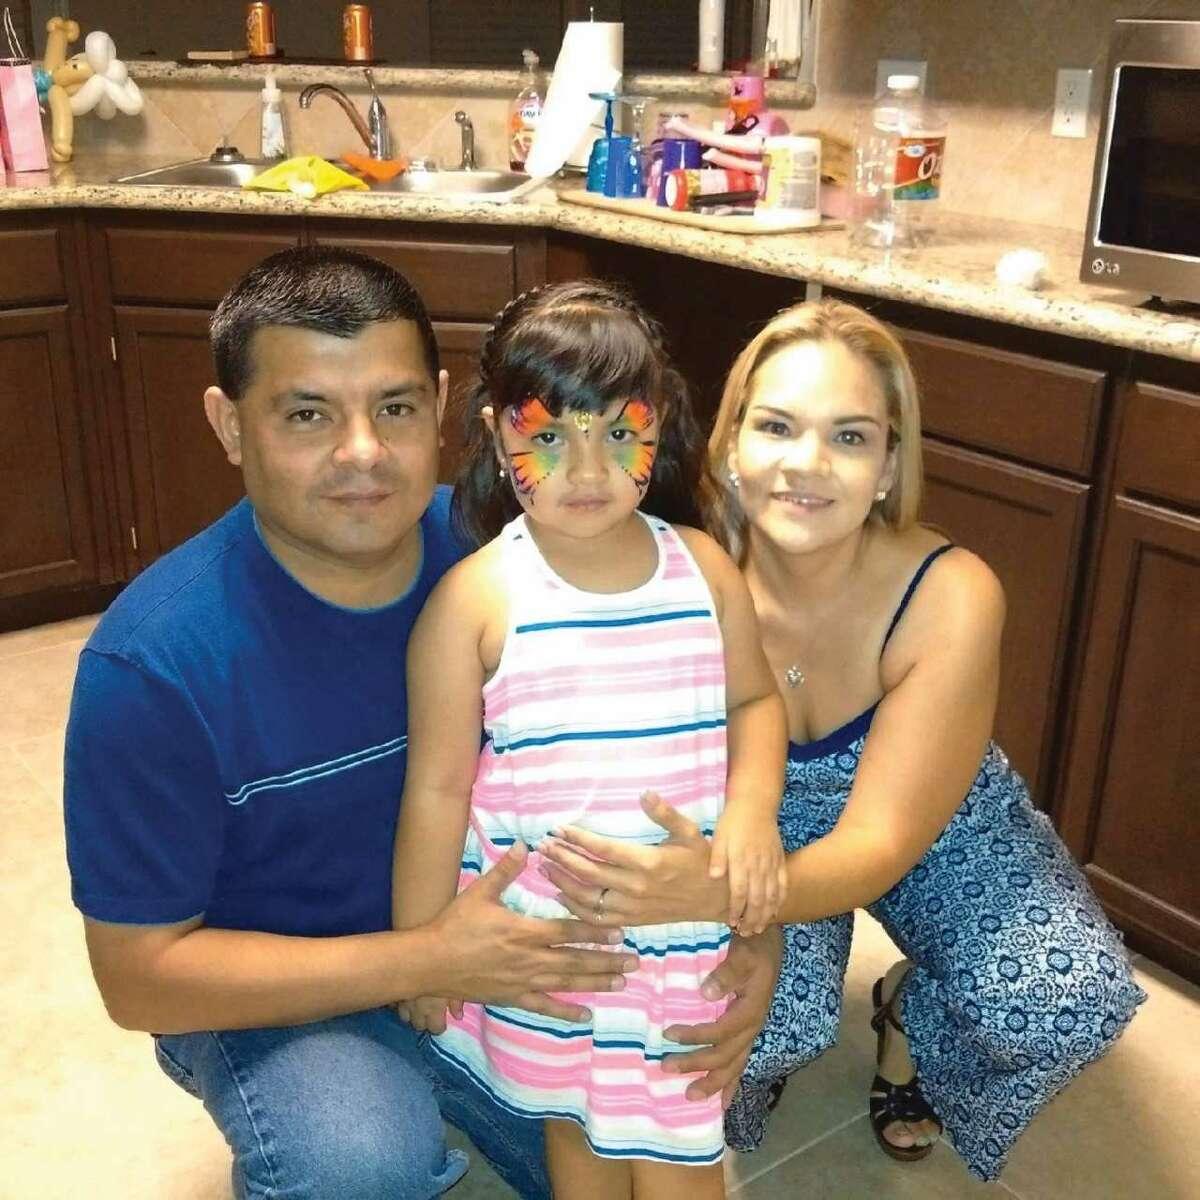 Laredo Morning Times MIS Director Michael Robert Castillo, left, is pictured with his wife, Maribel Castillo, and daughter Victoria Kristelle Castillo.